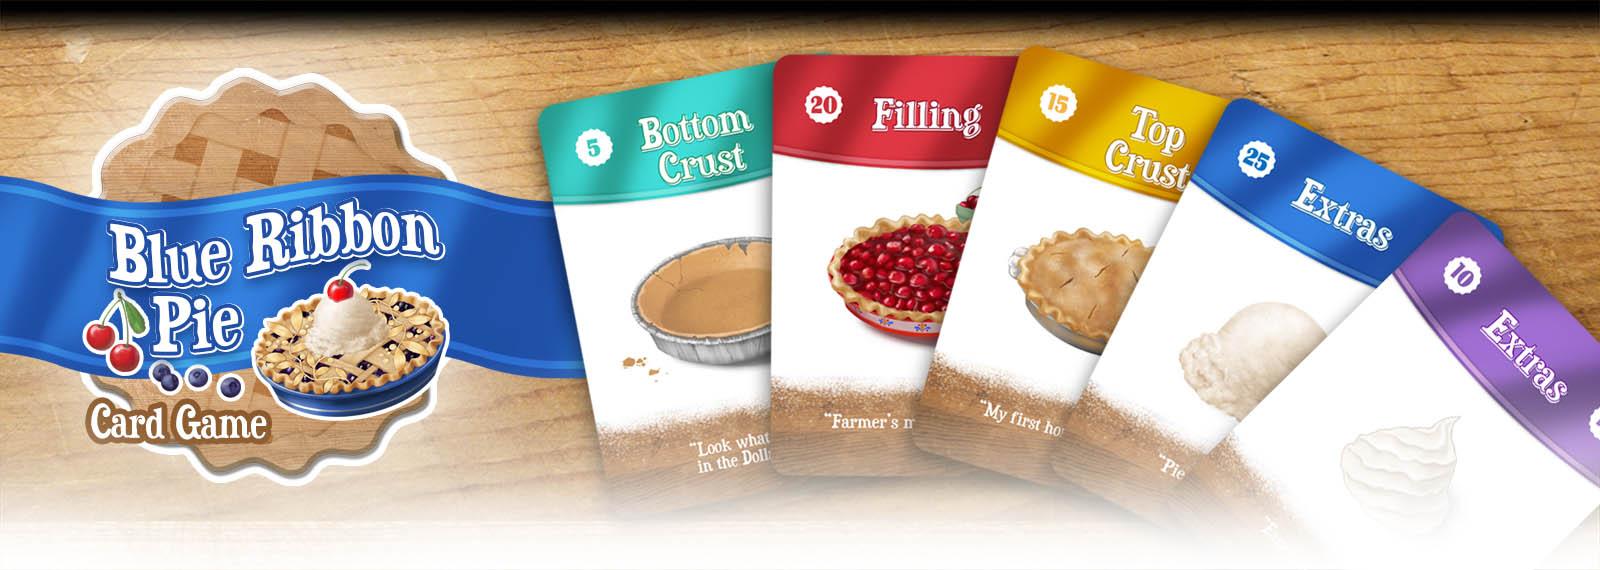 Blue Ribbon Pie card game